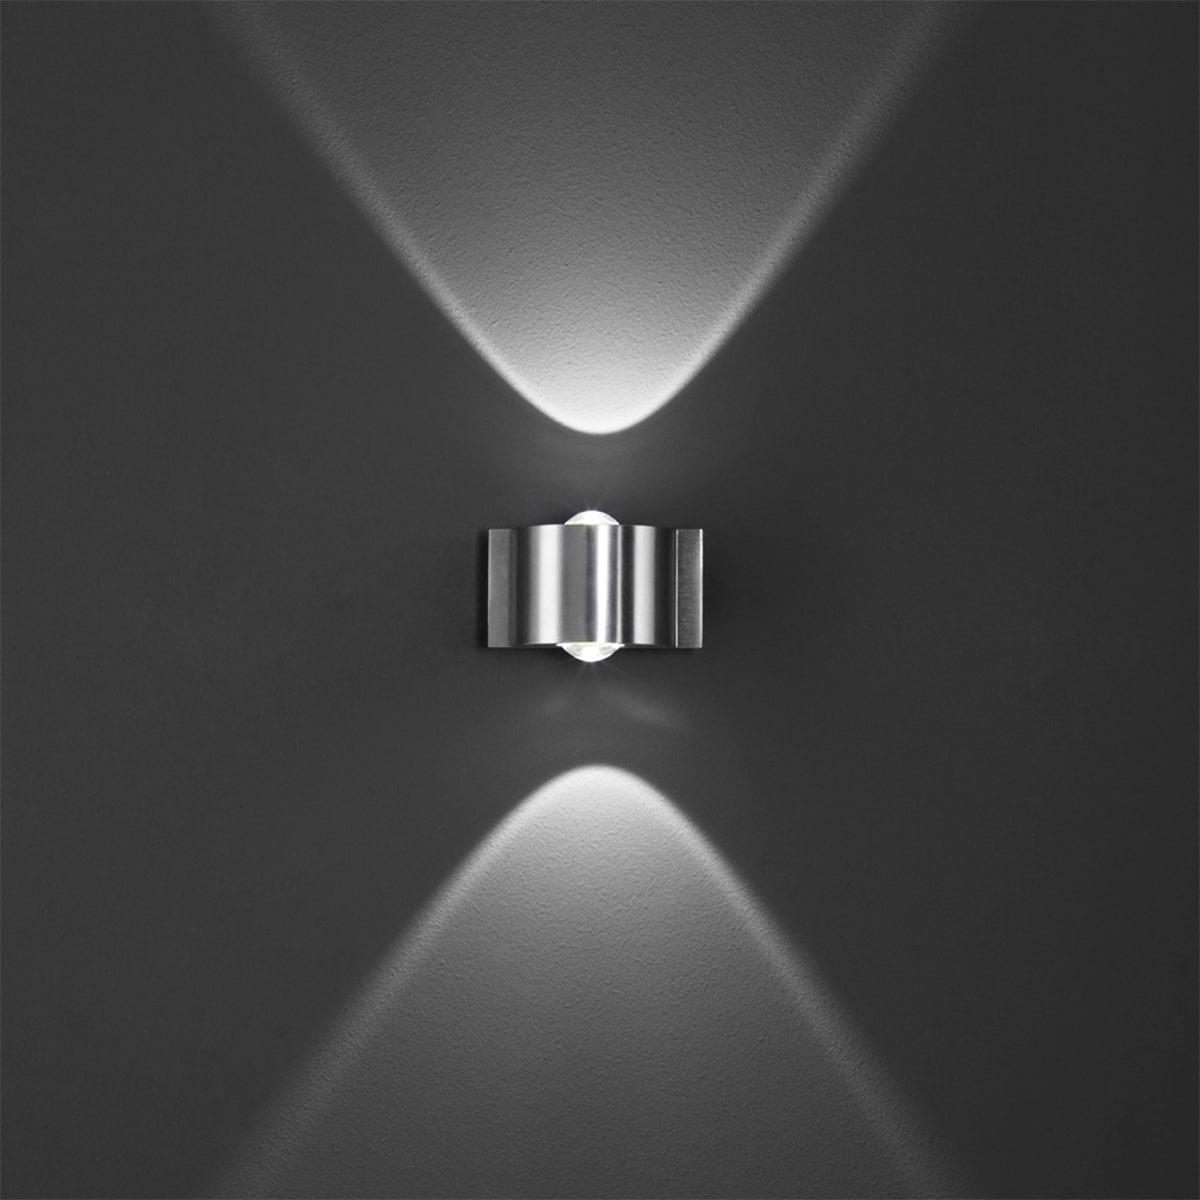 B-Leuchten Stream LED Wandleuchte